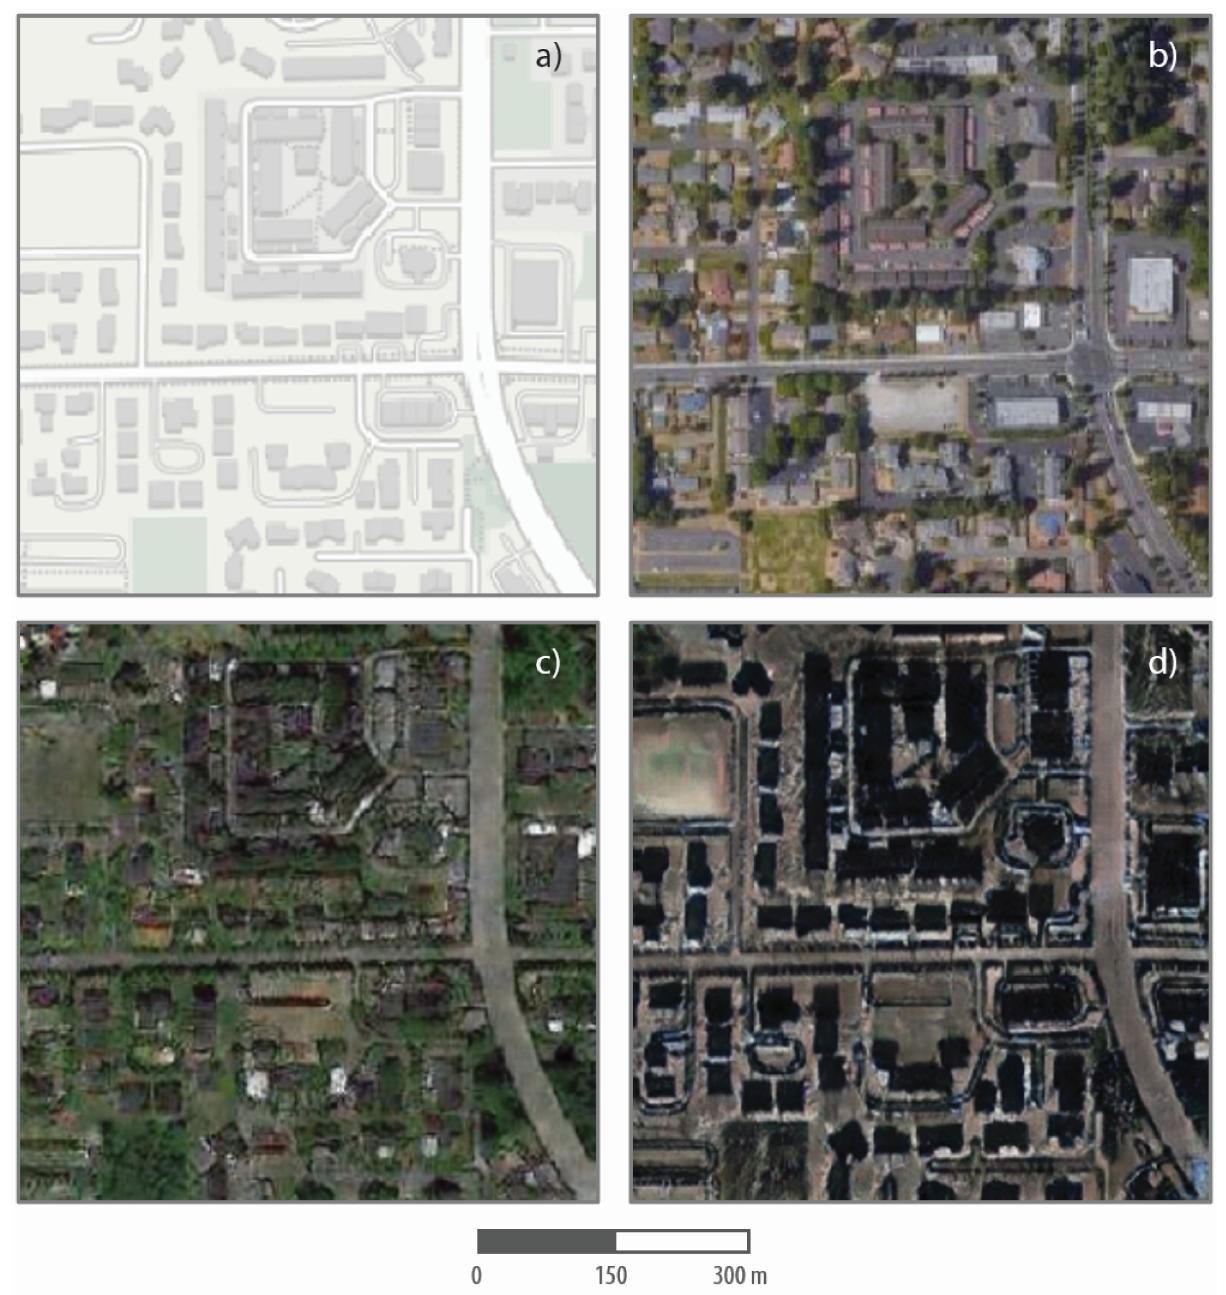 Maps in four quadrants